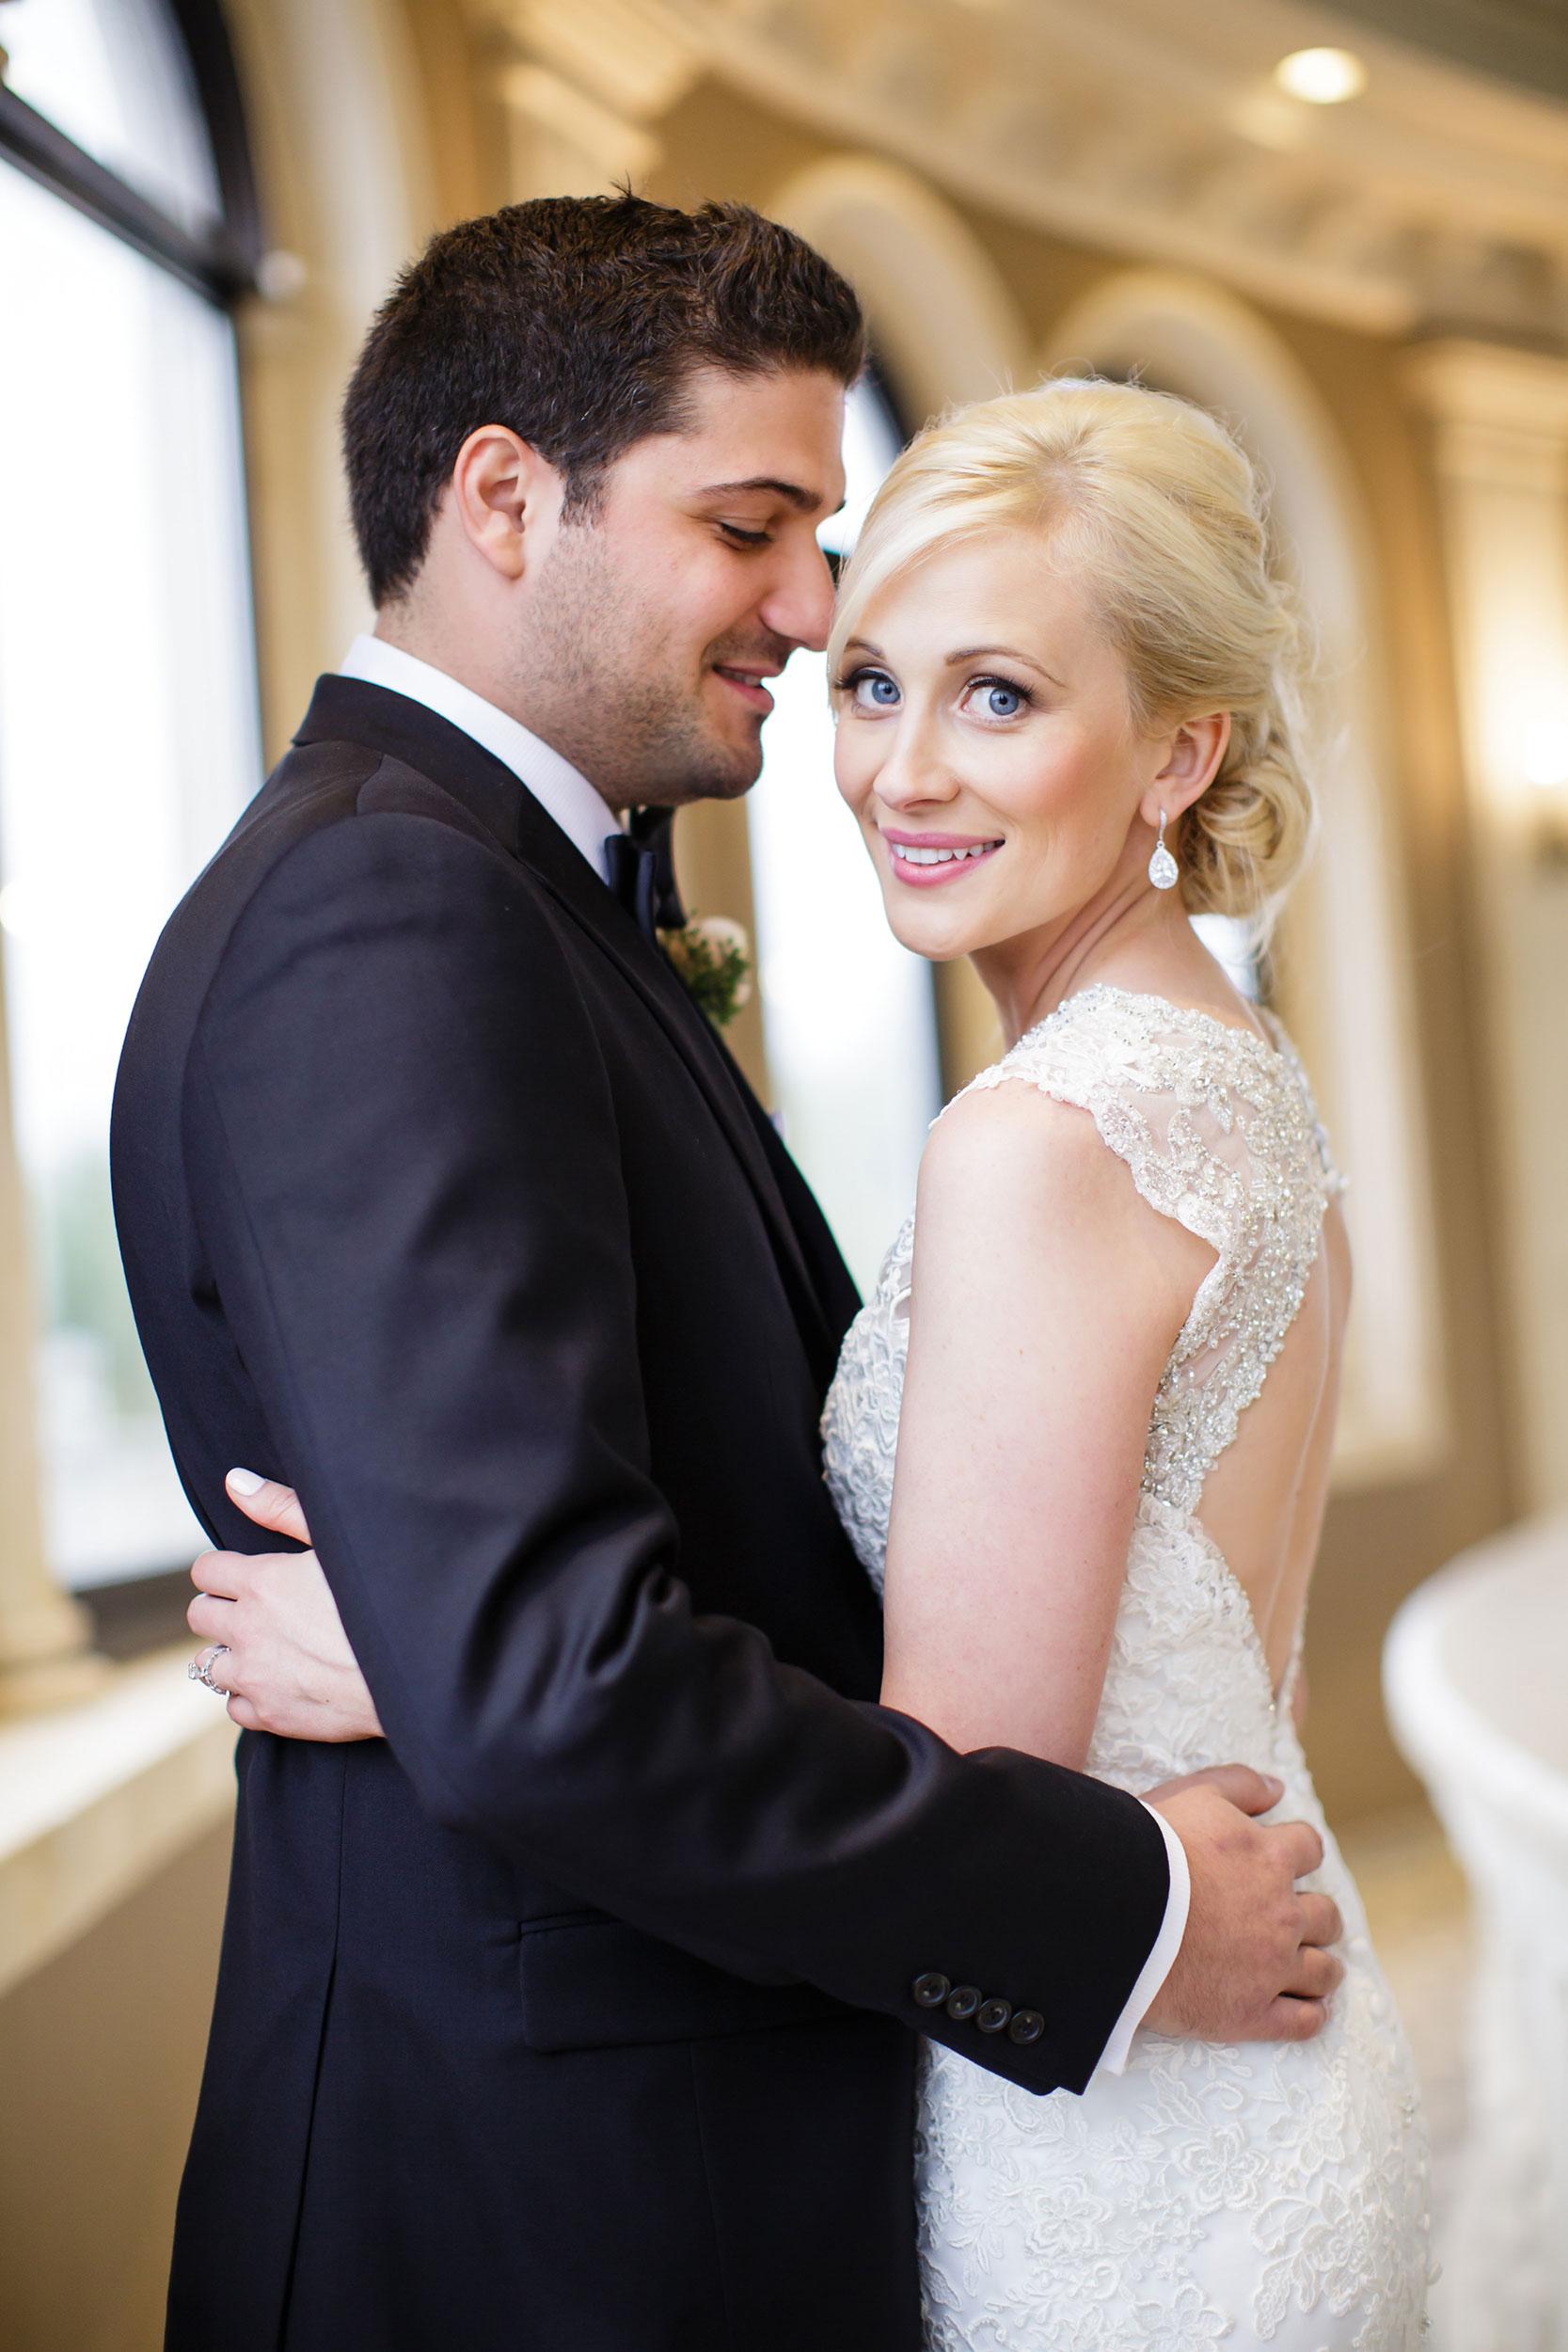 stylish-wedding-photography-windsor-toronto-ontario-wedding-photographer-winery-eryn-shea-photography-30.JPG